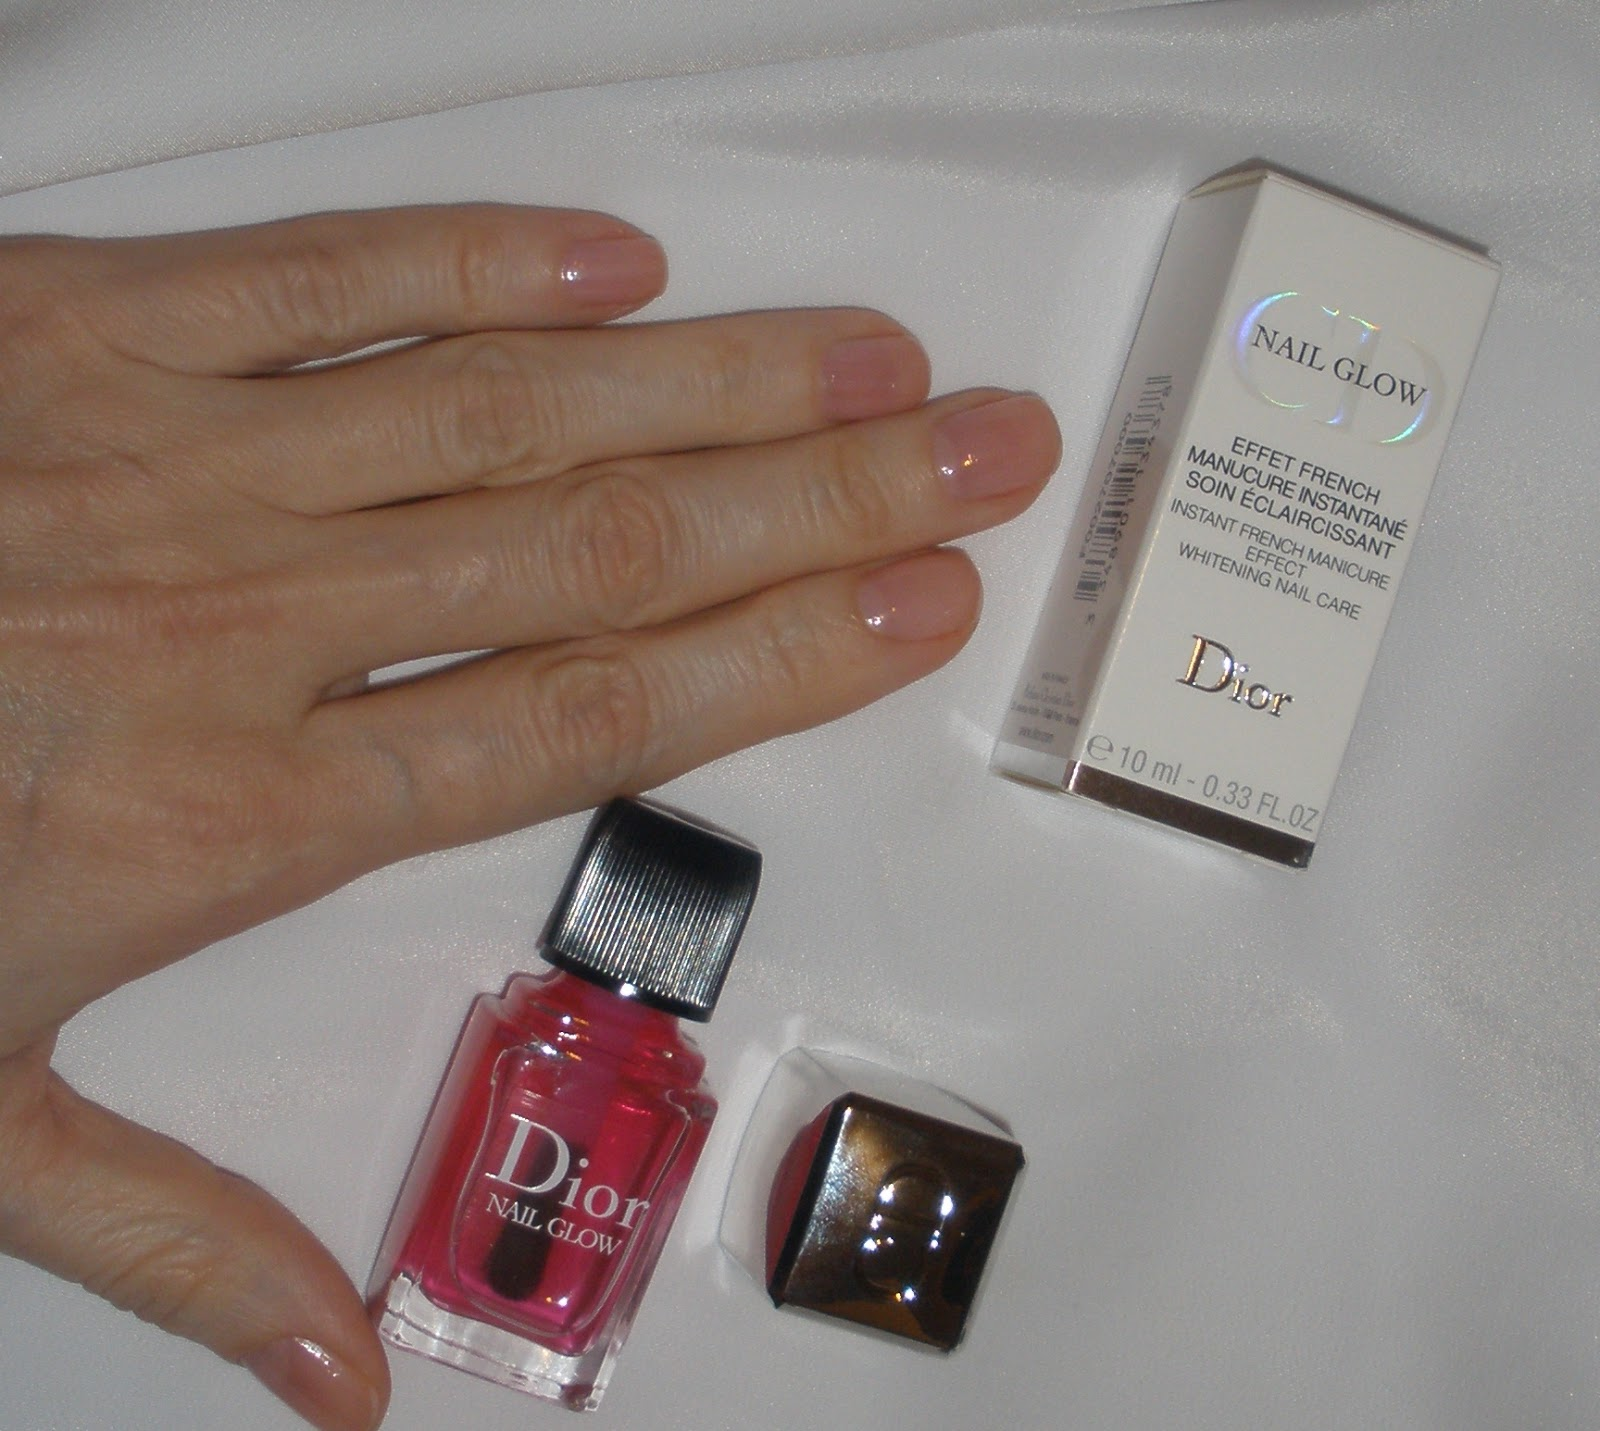 Dior nail glow лак для ногтей